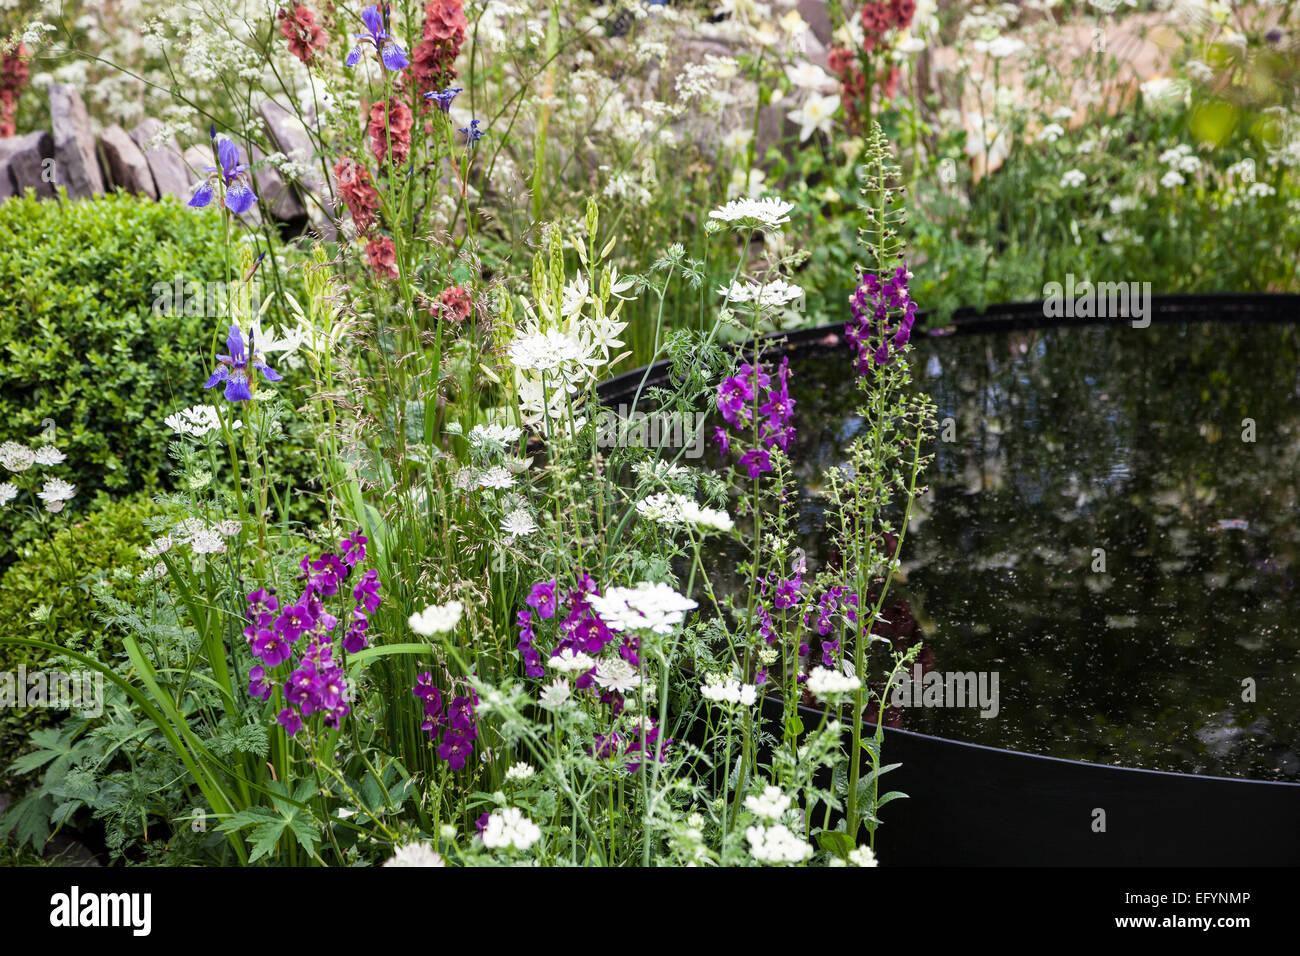 Buxus ball stockfotos buxus ball bilder alamy for Pip probert garden designer